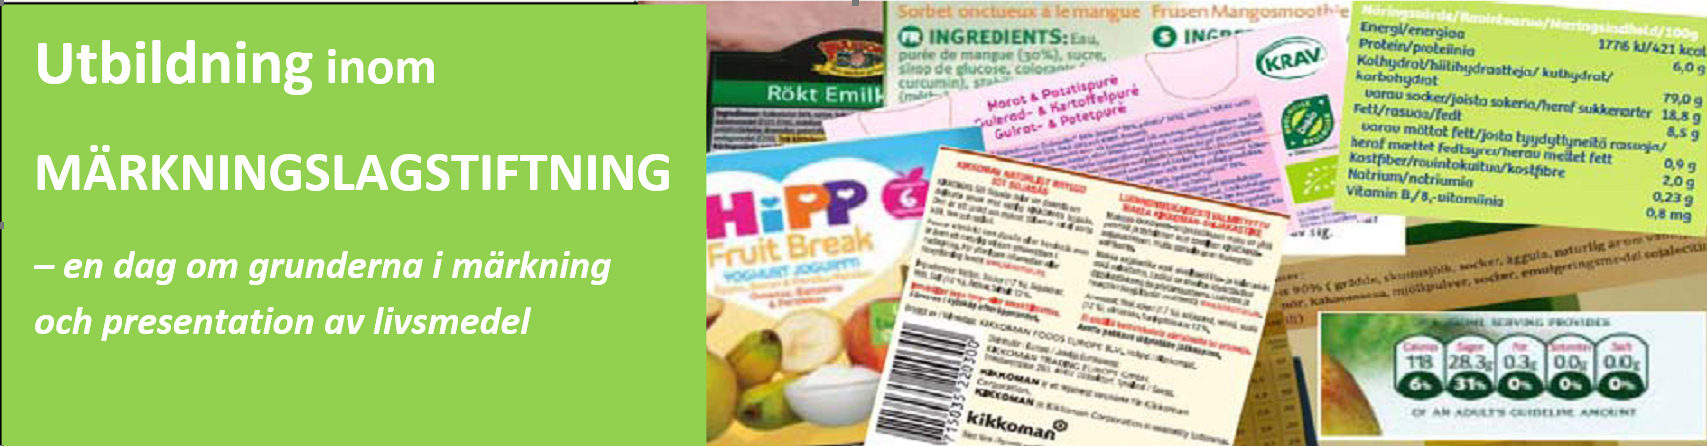 Herax Food Solutions